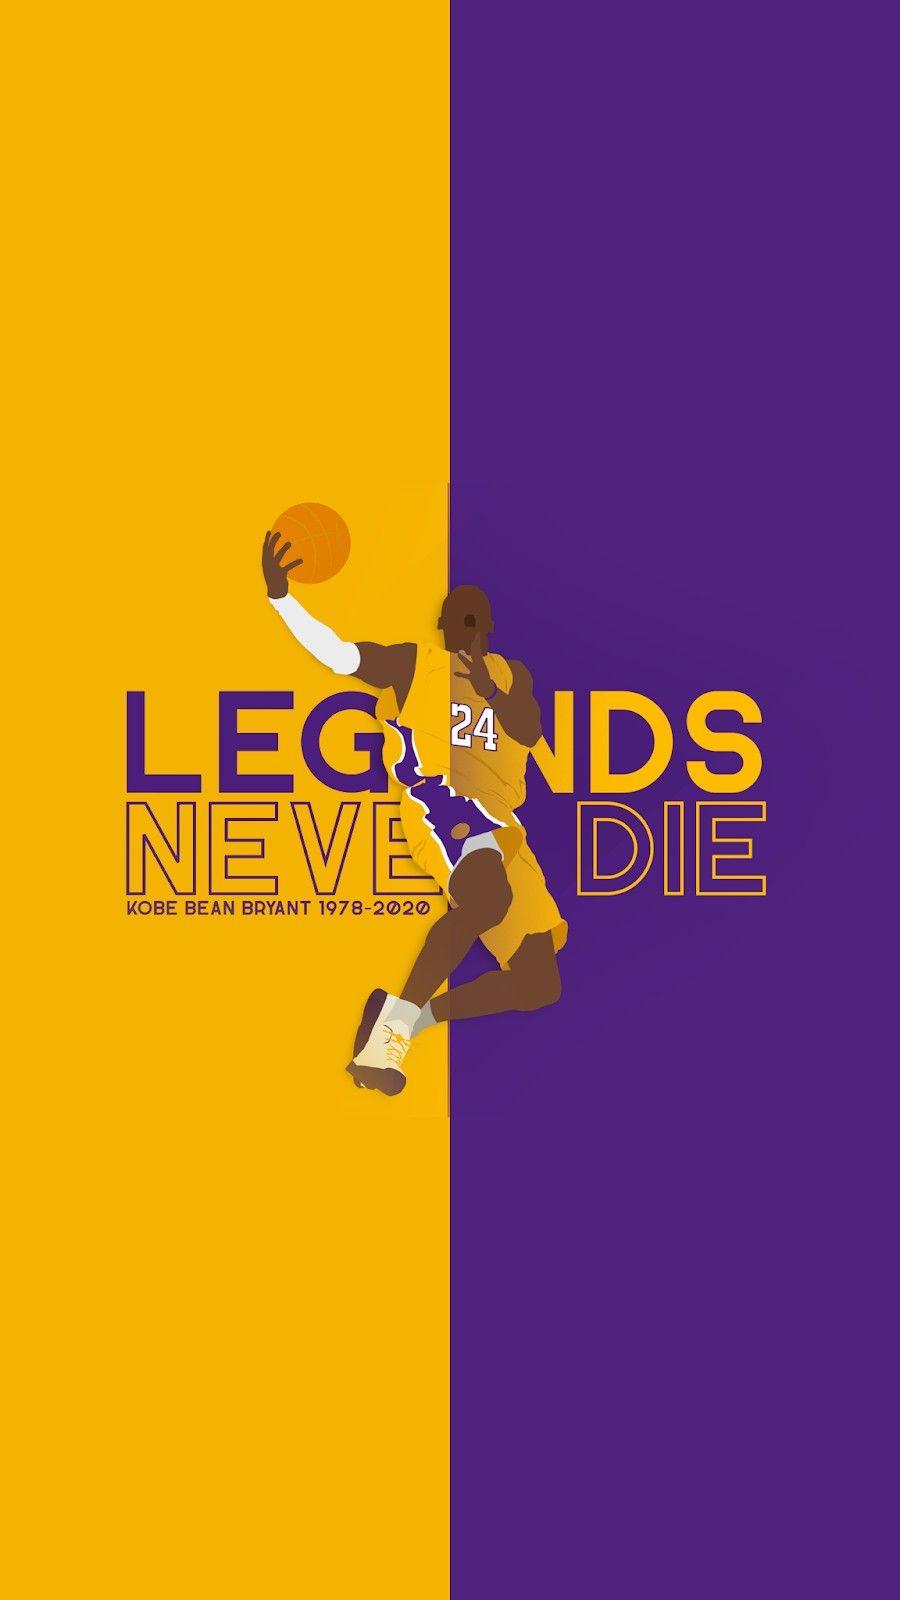 Mamba Forever In 2020 Kobe Bryant Wallpaper Kobe Bryant Poster Kobe Bryant Quotes